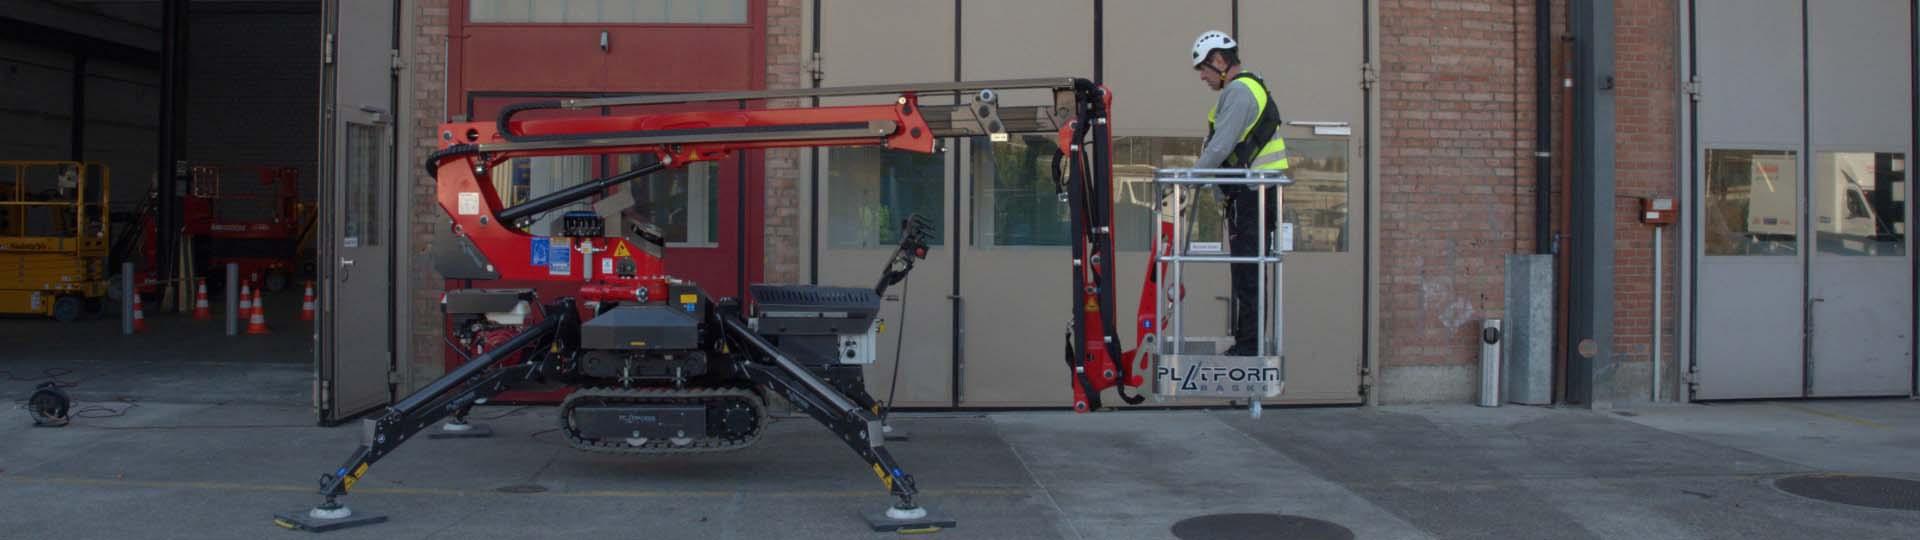 Ausbildung Hubarbeitsbühne Arbeitsbühne IPAF Kategorie 1a 1b 3a 3b